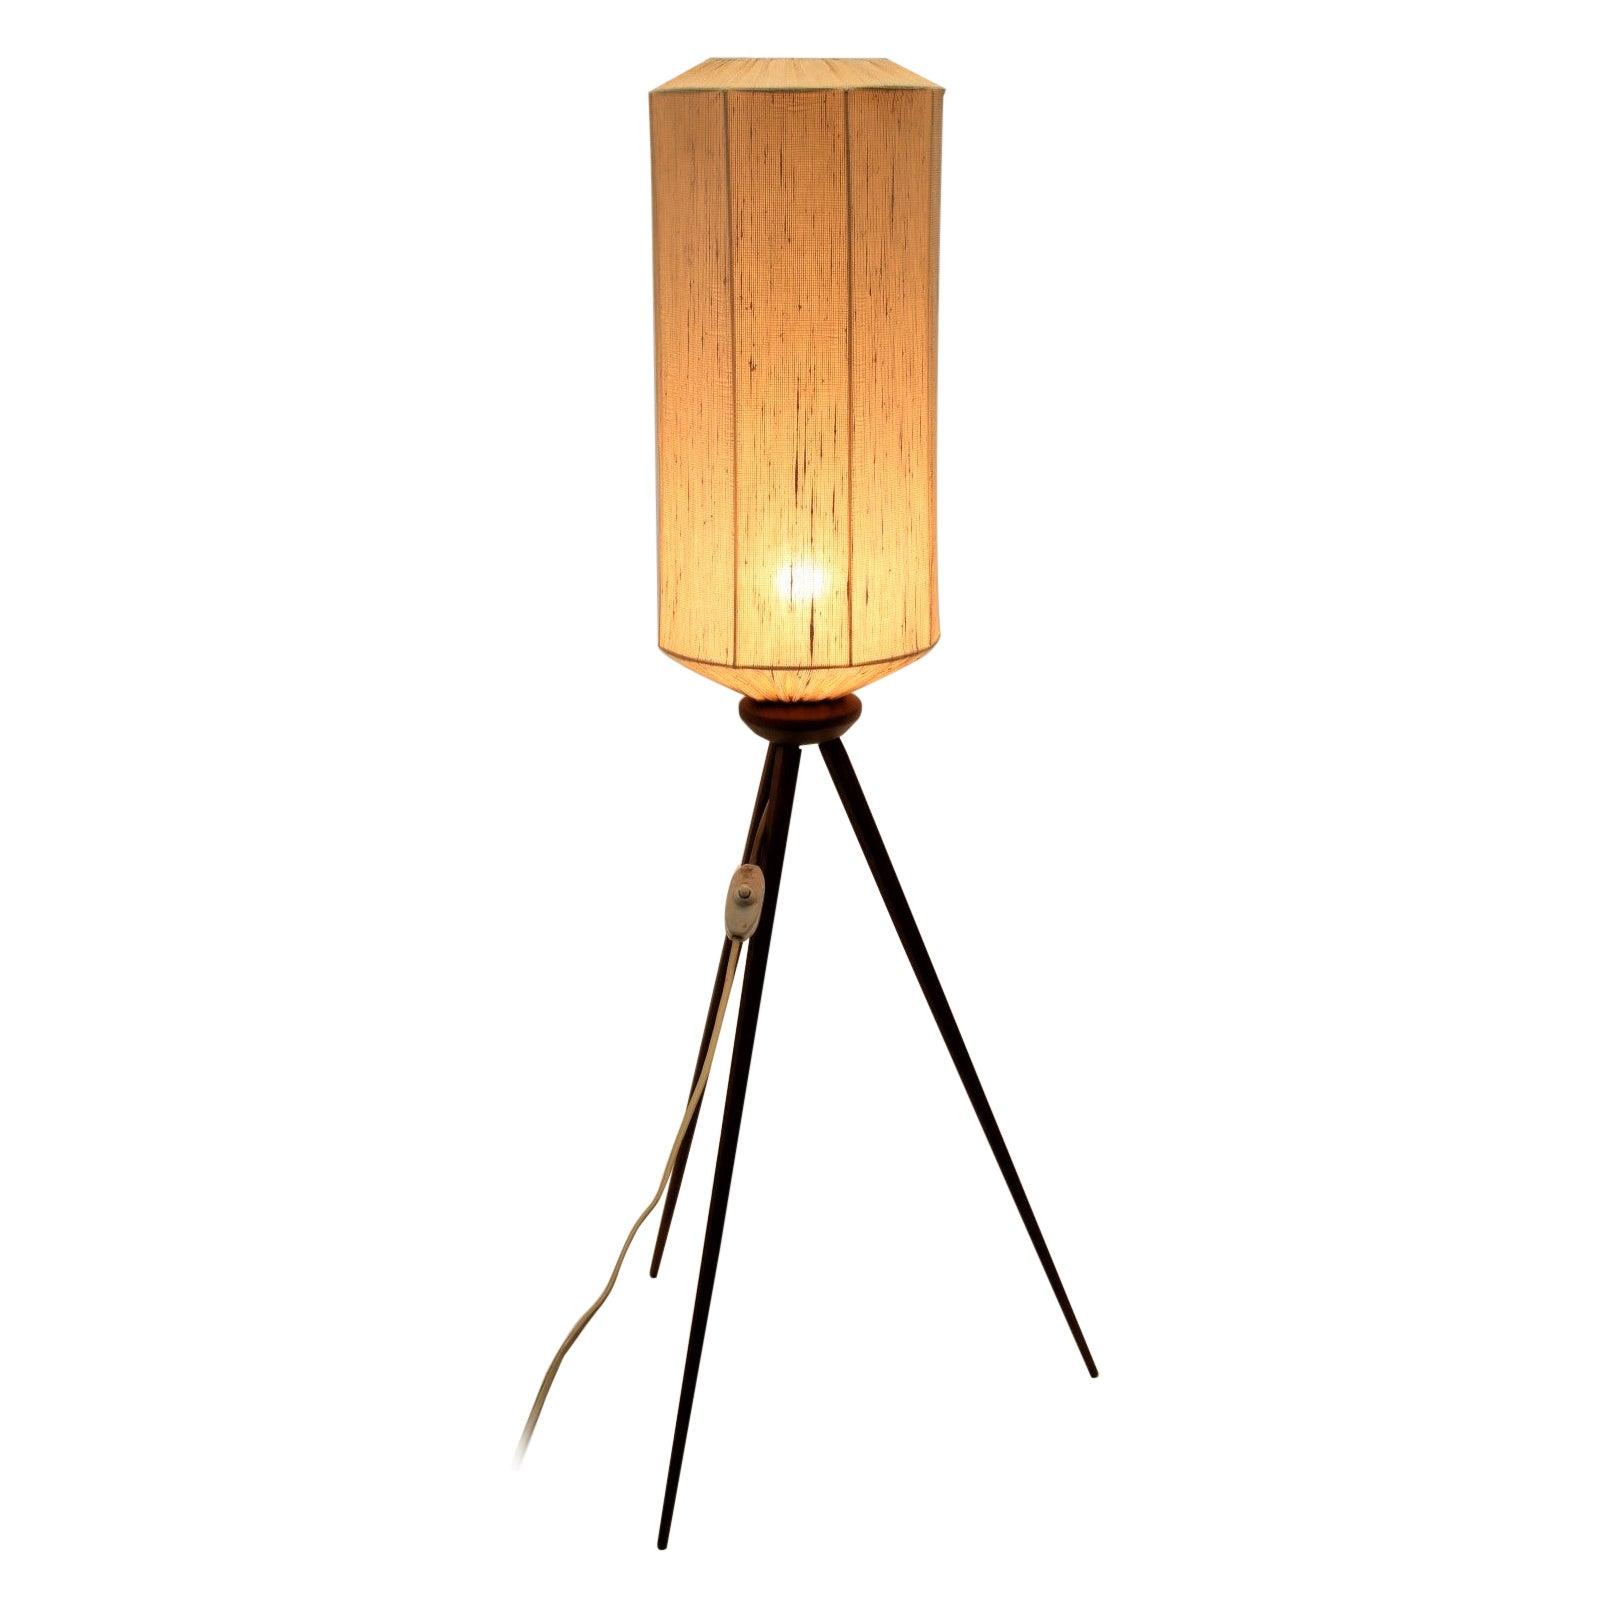 Tripod Floor Lamp Teak Legs and Textile Lampshade, 1950's